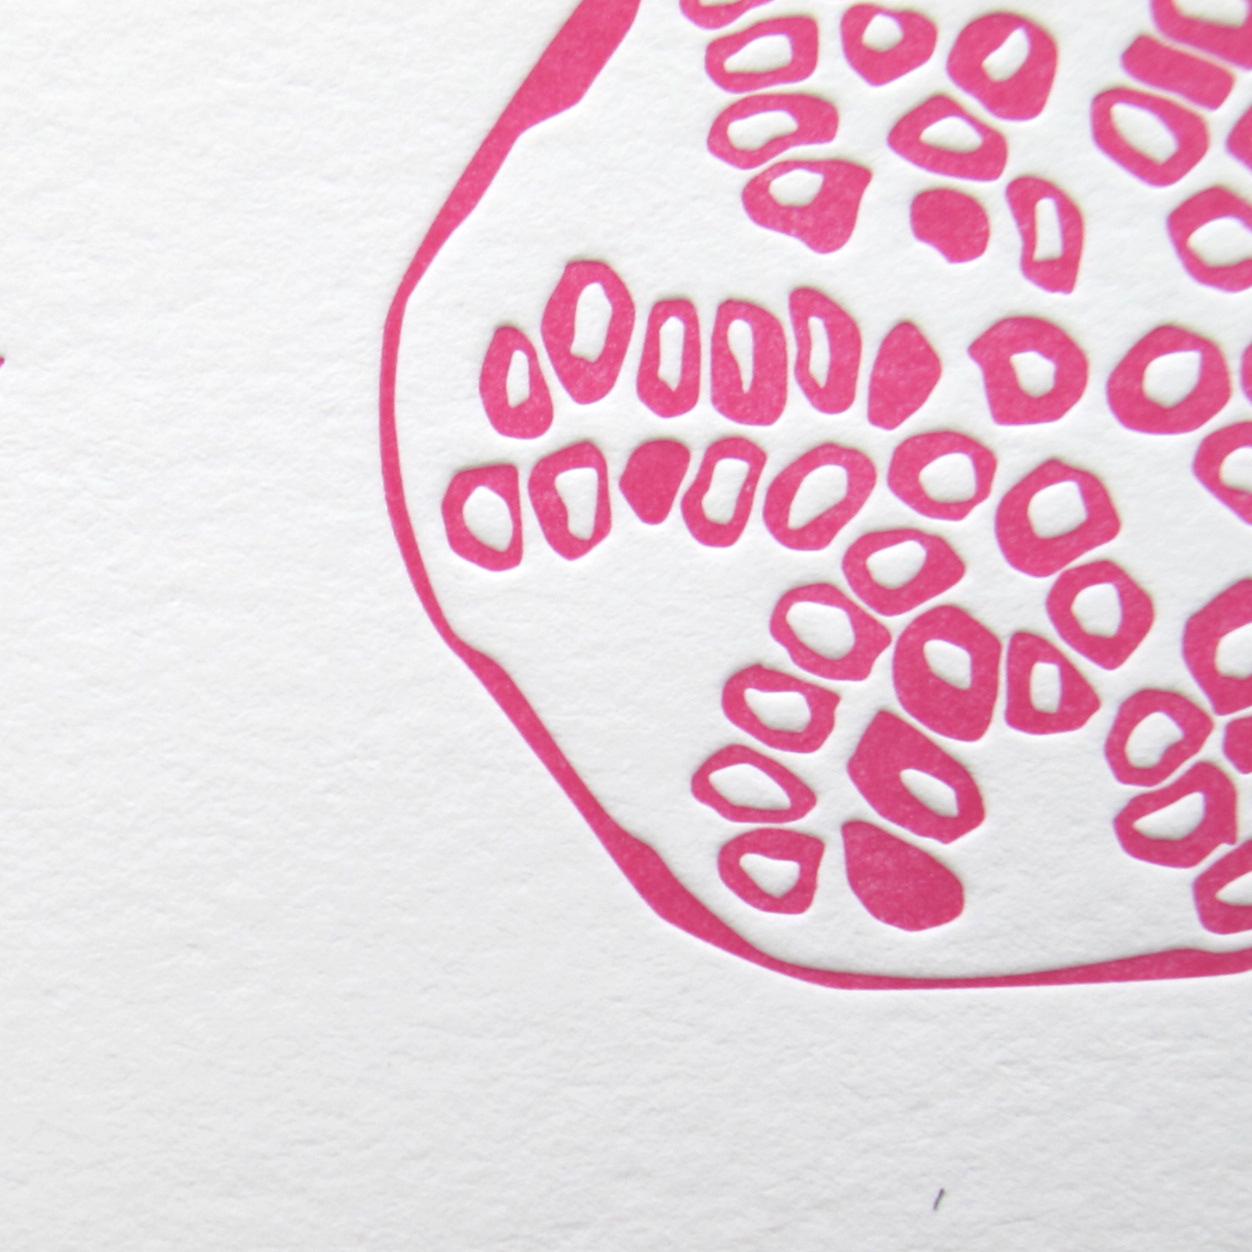 stationery_pomegranate_4.jpg